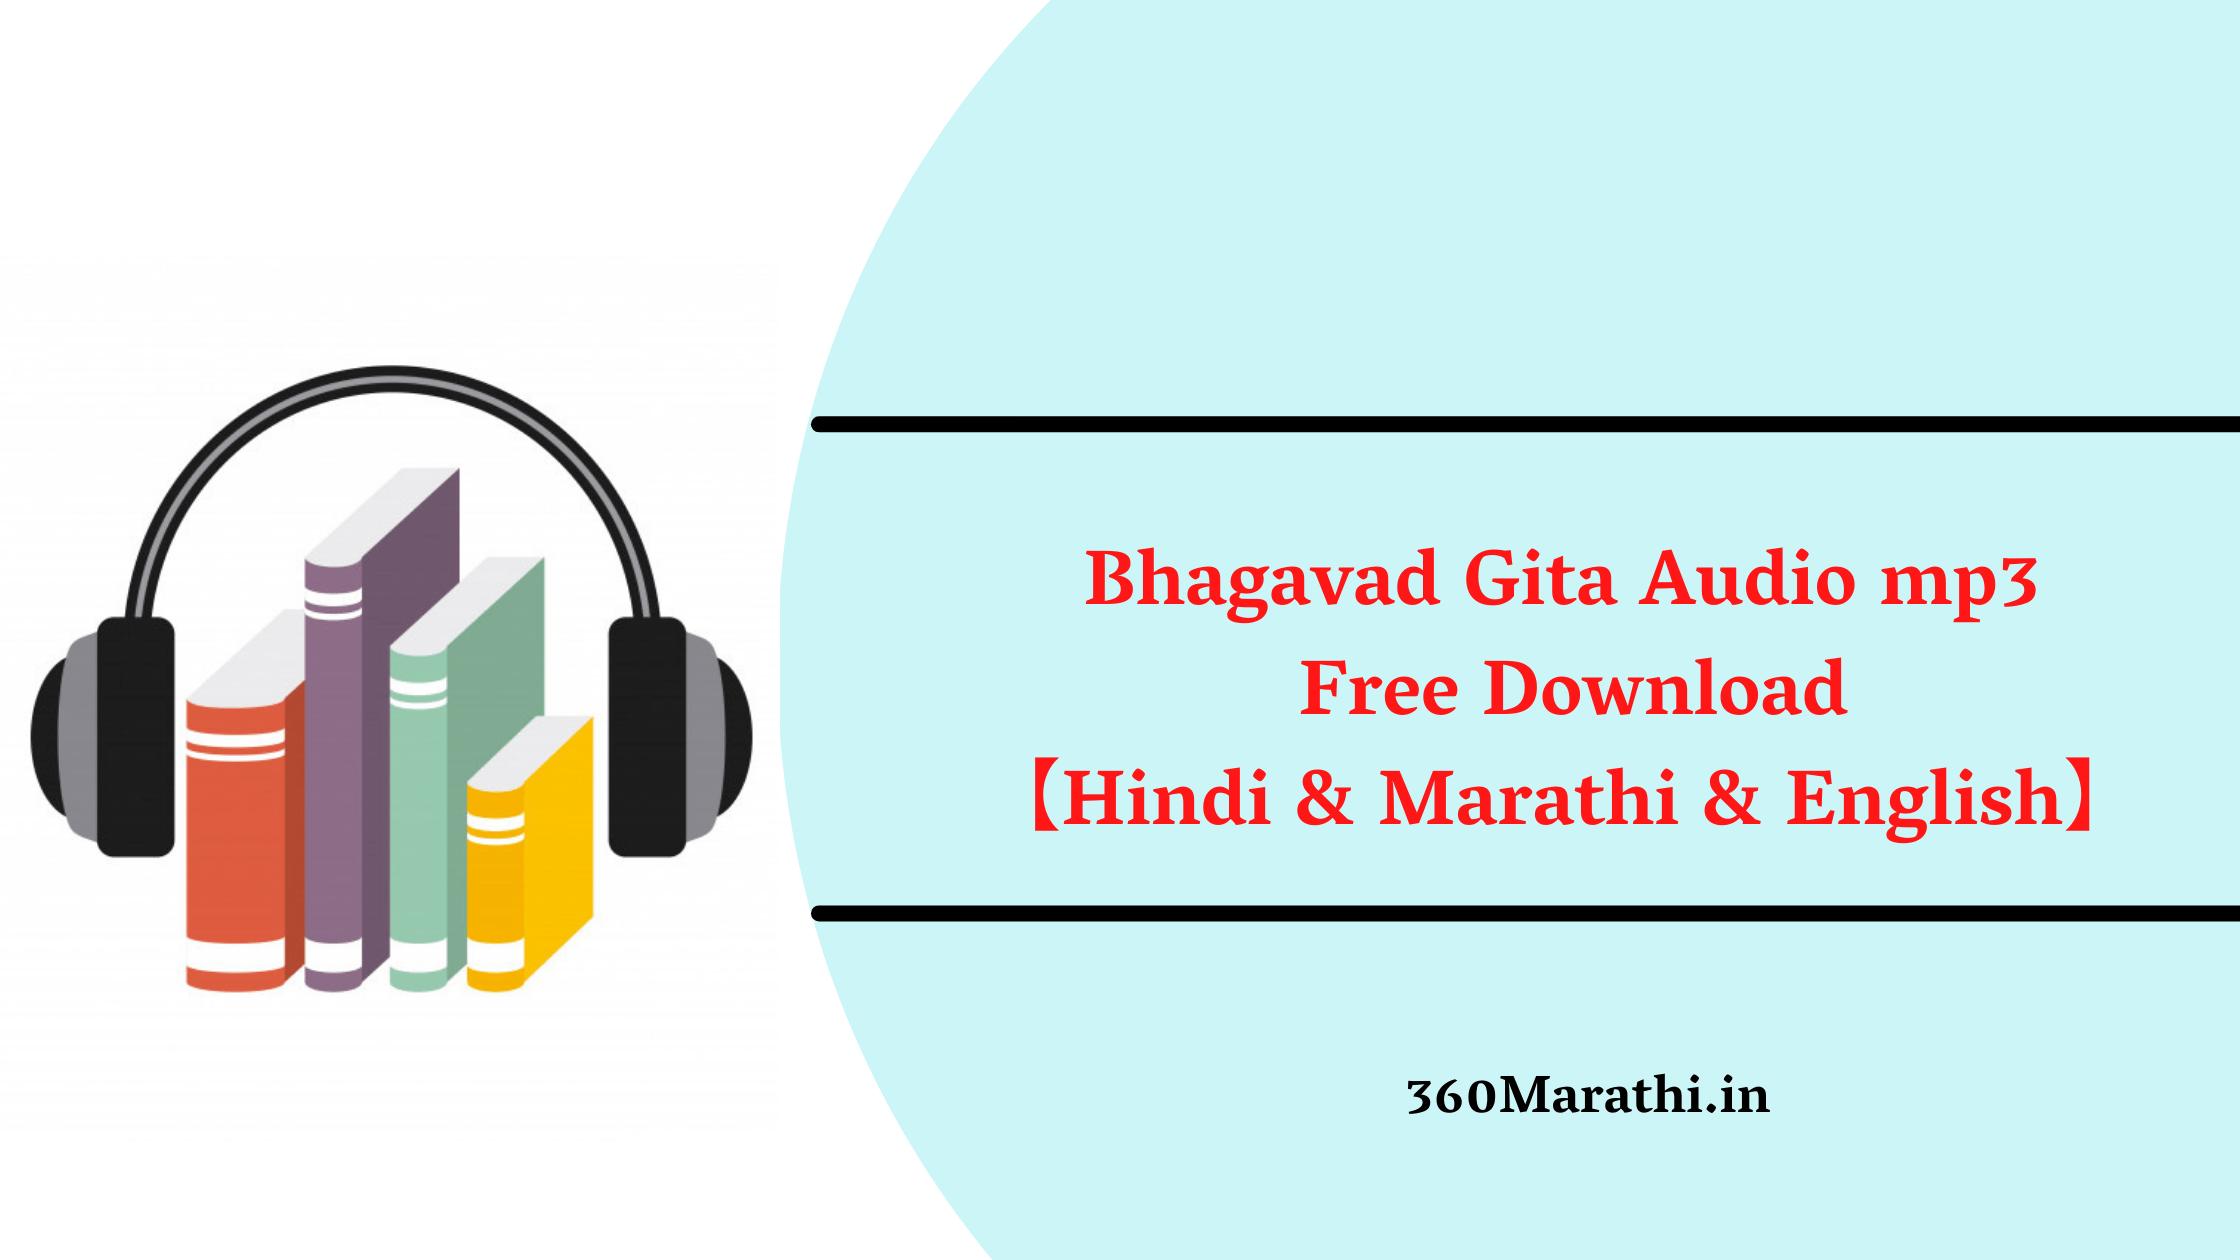 【Free Download】Bhagavad Gita Marathi Audio mp3 Free Download